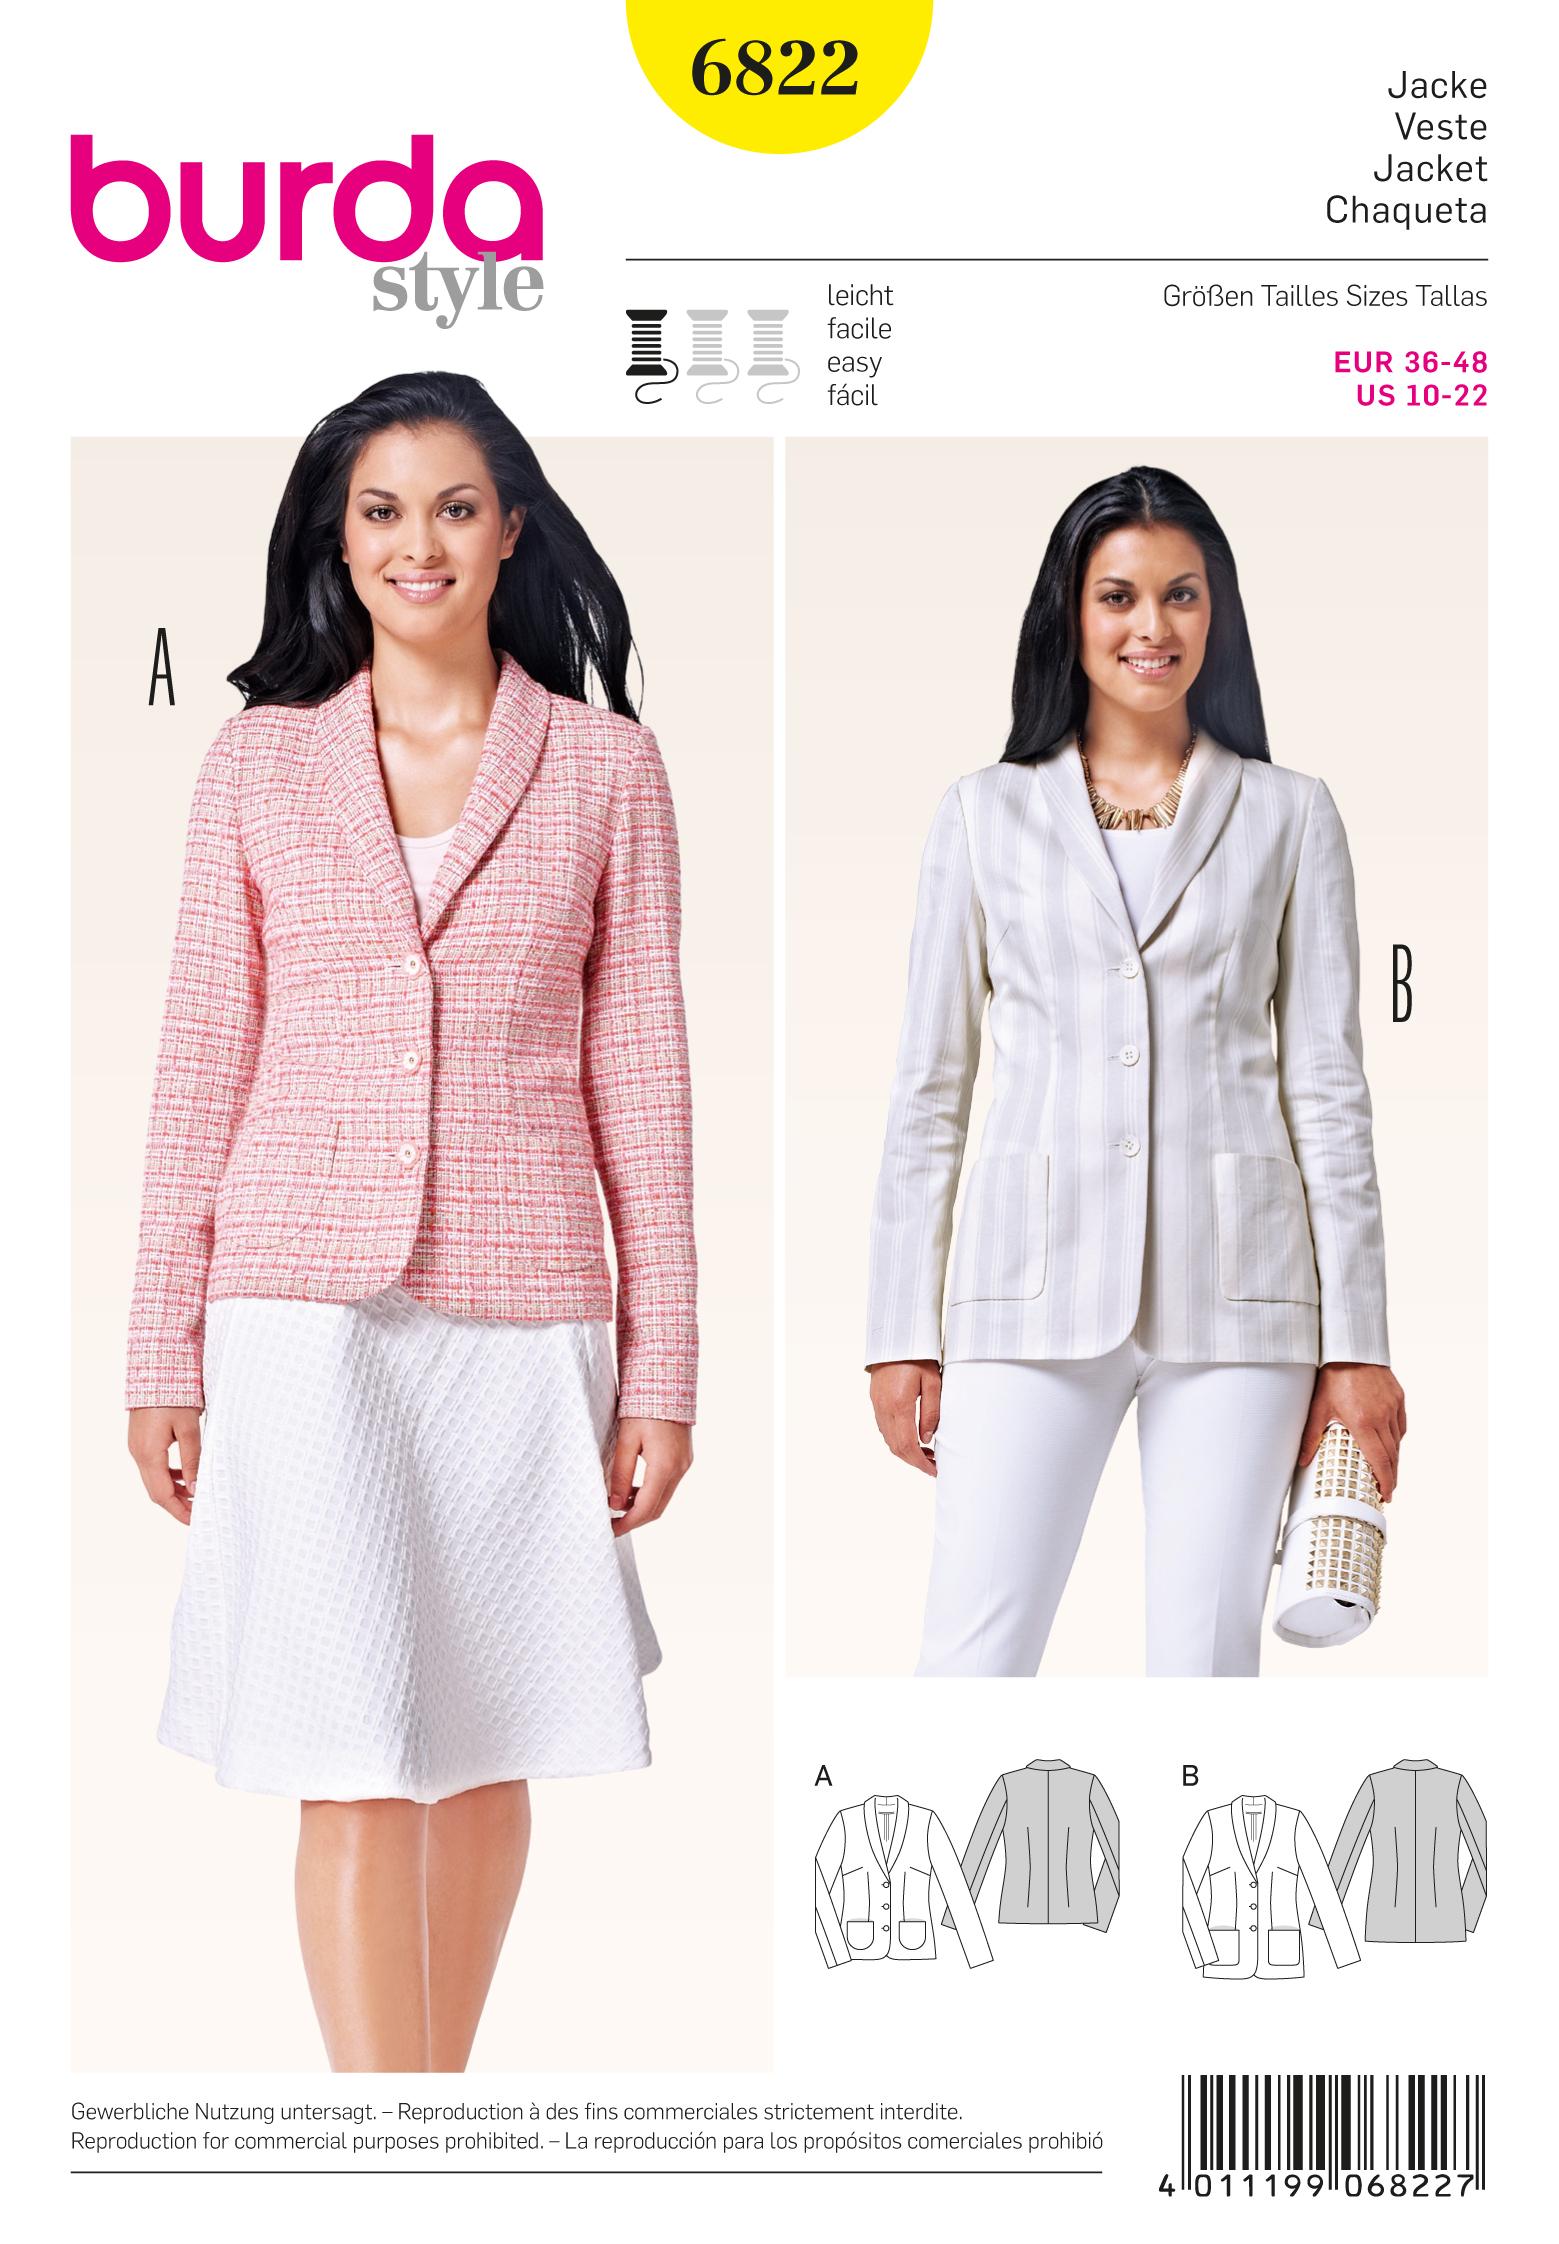 Burda 6822 burda style jackets coats vests prevnext jeuxipadfo Gallery